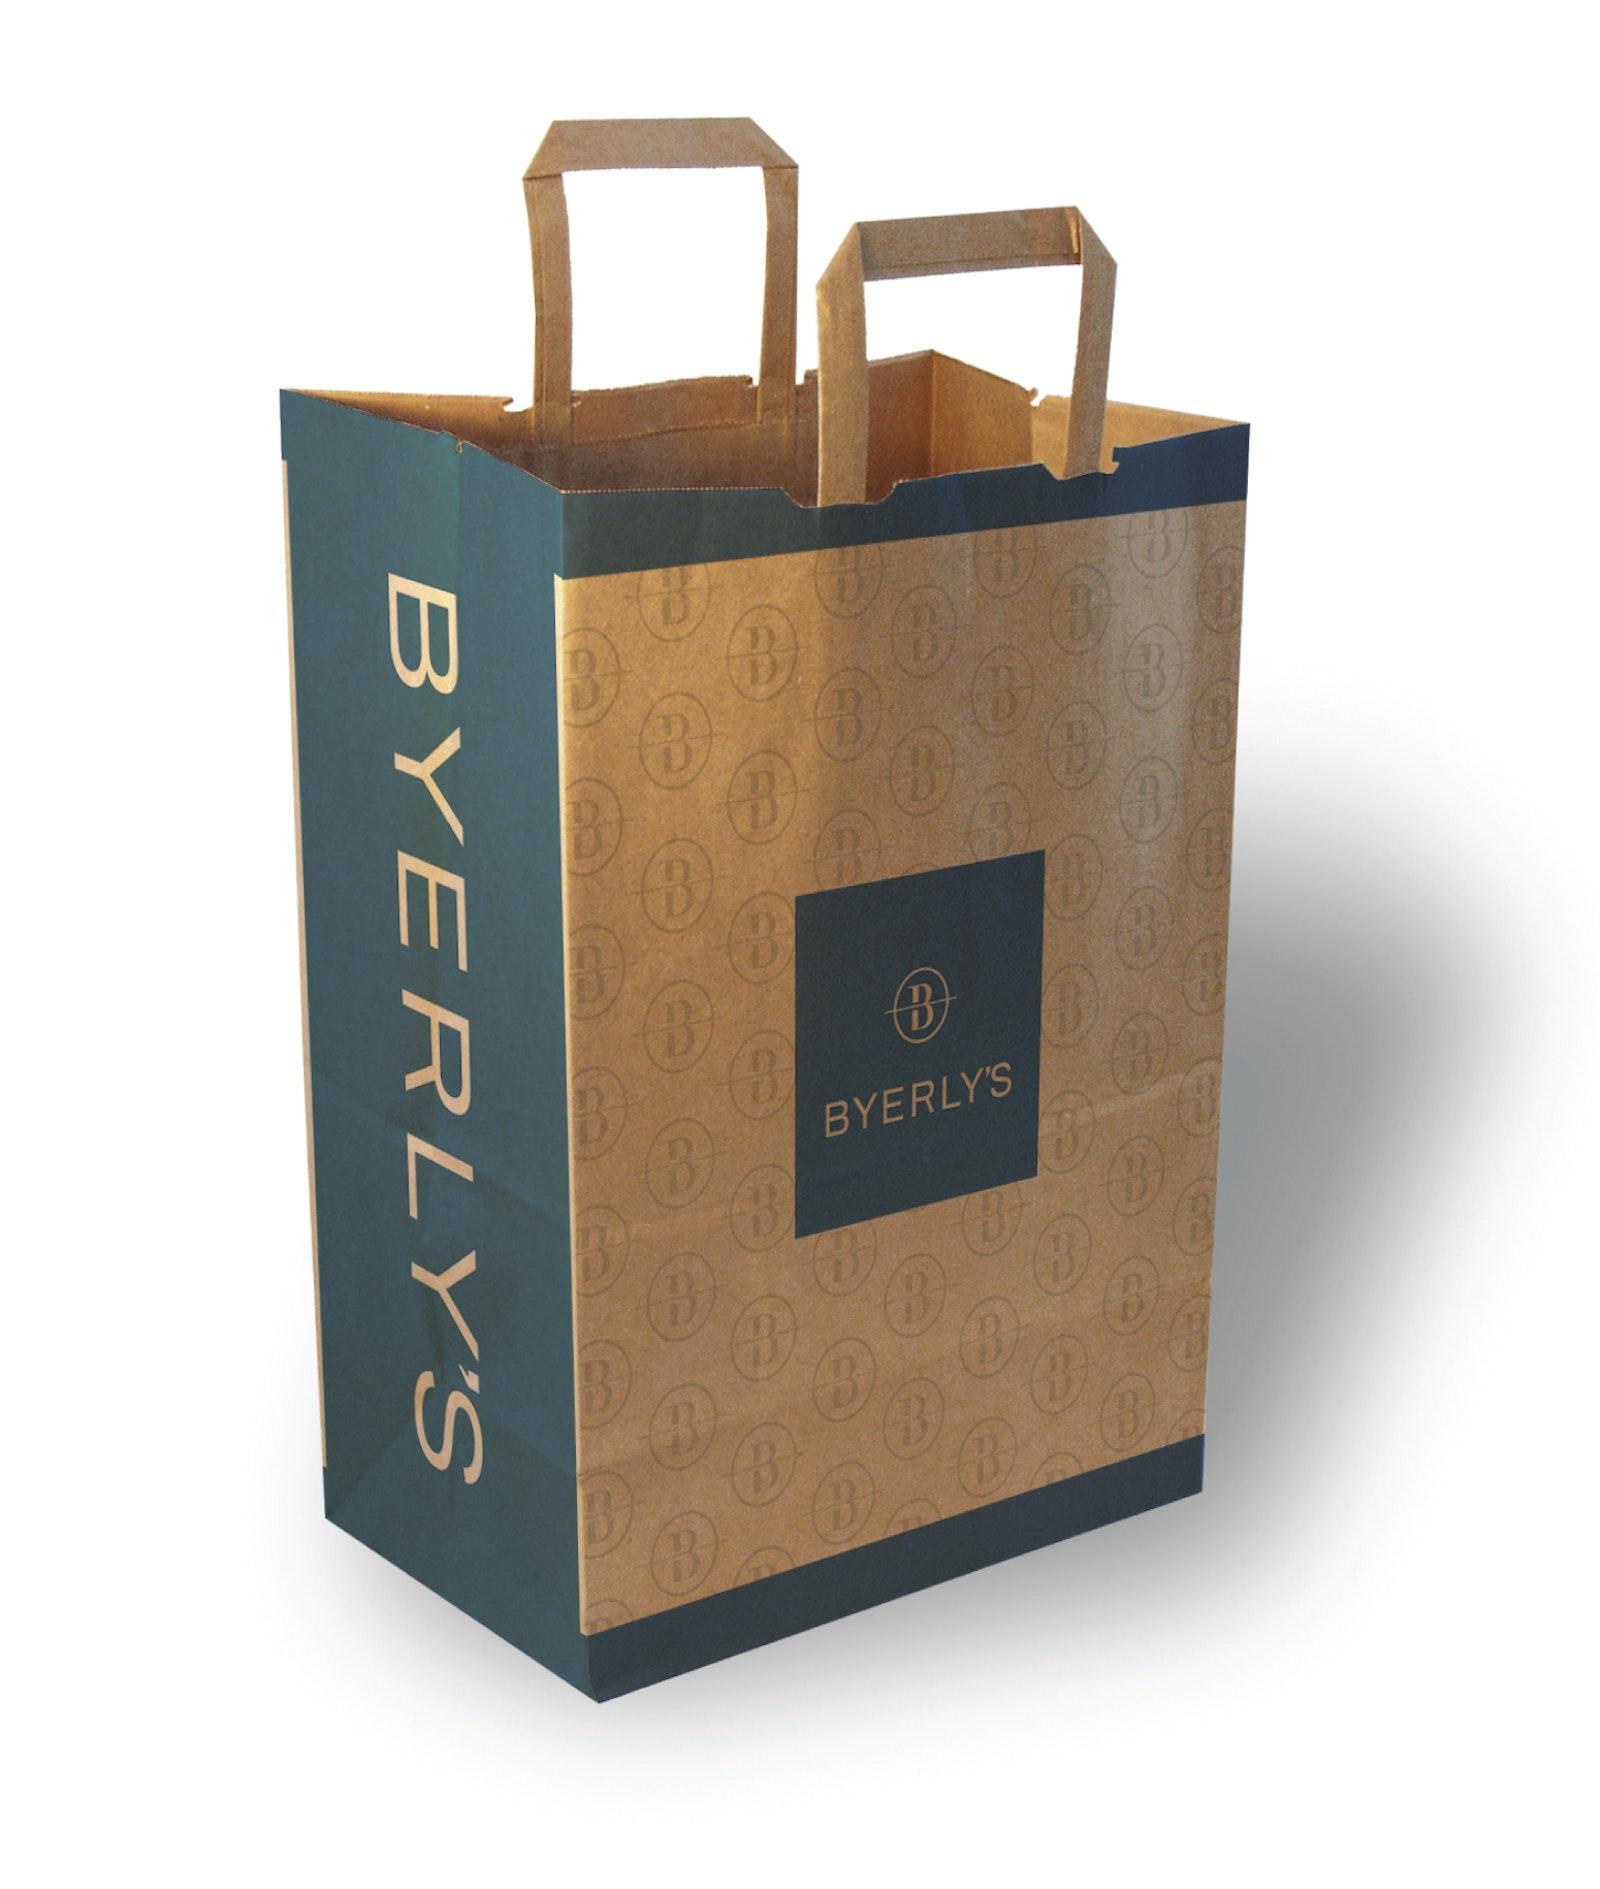 Byerlys bag a